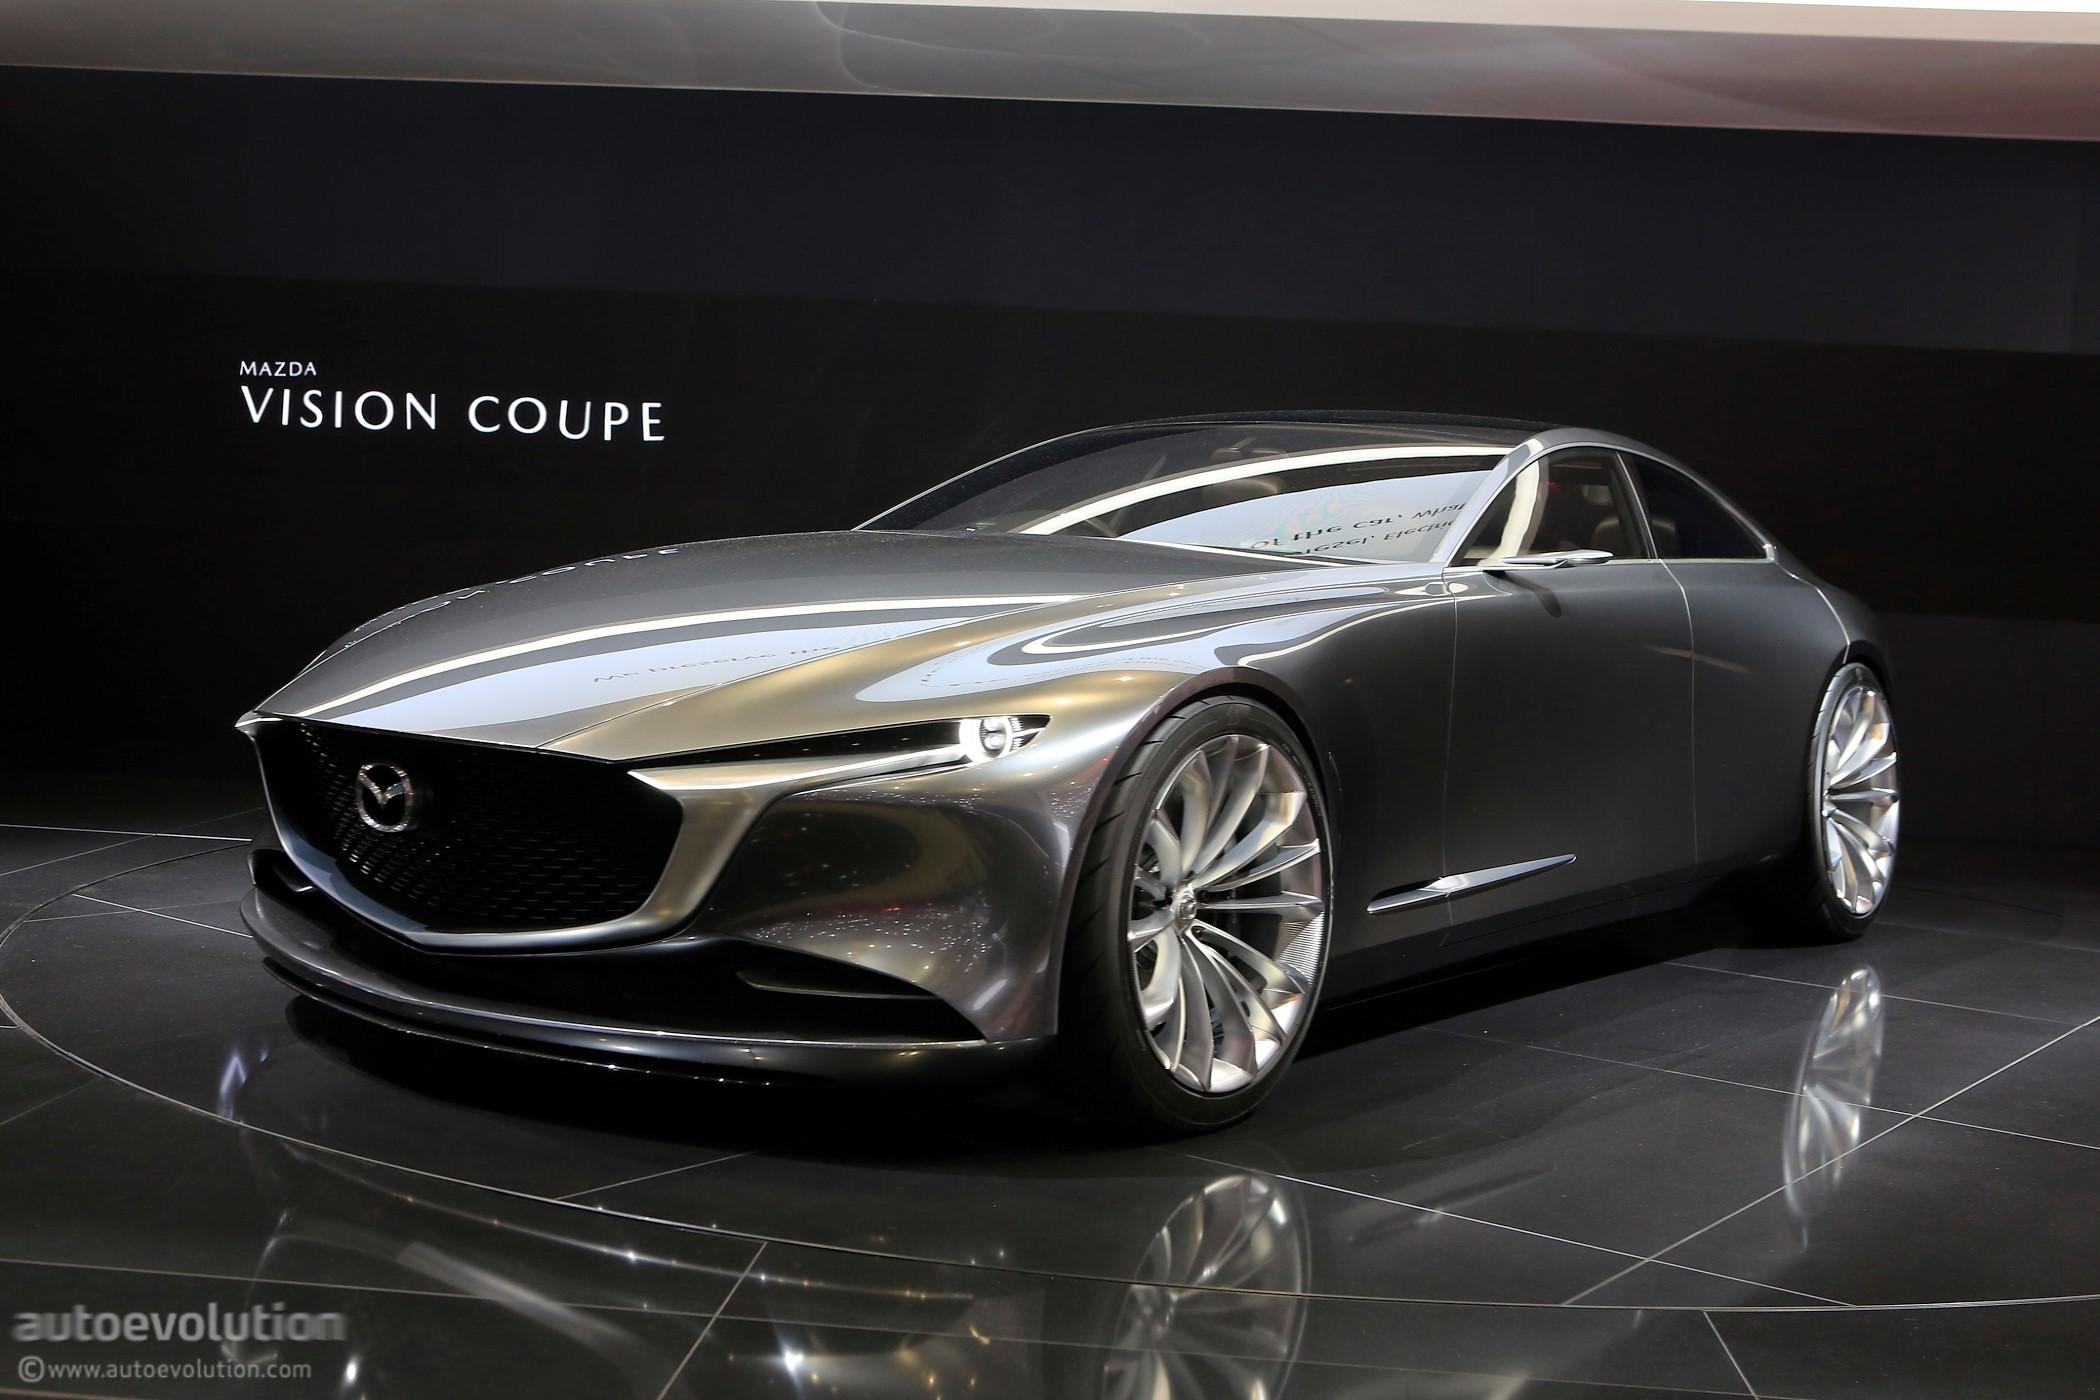 2018 Mazda Rx7 >> Mazda Vision Coupe Makes European Debut In Geneva, Looks Stunning - autoevolution